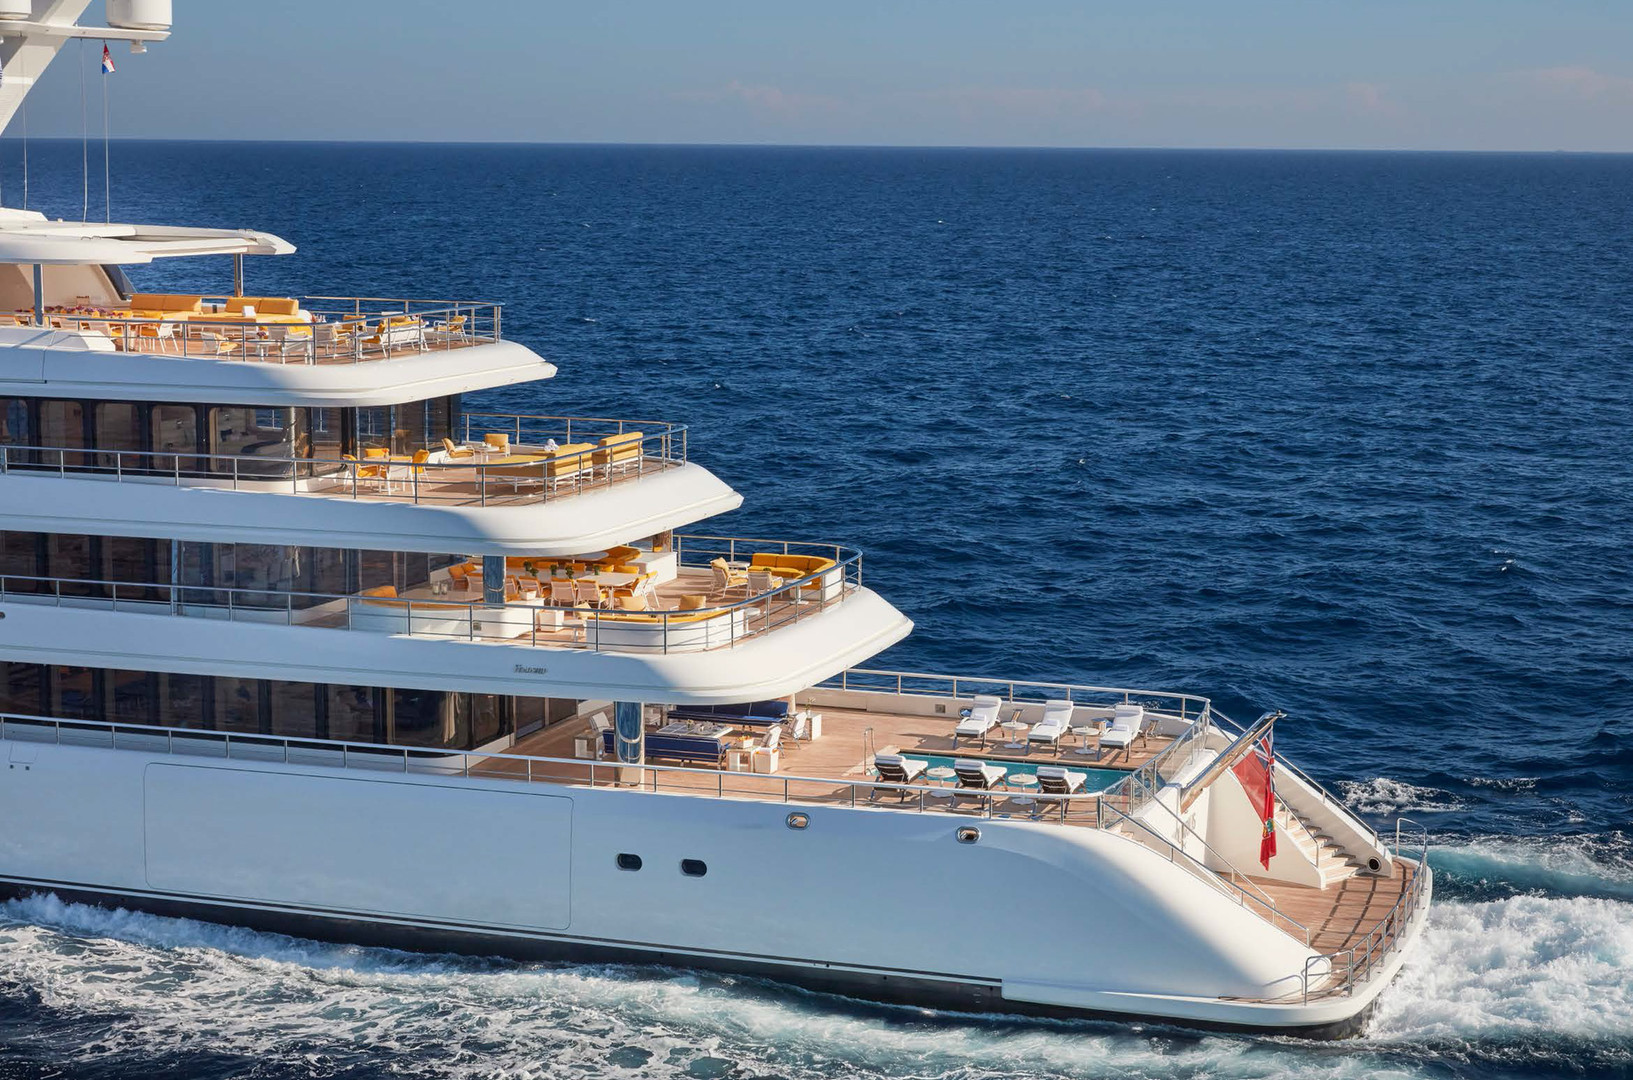 Yacht AQUARIUS - 92m mega yacht charter